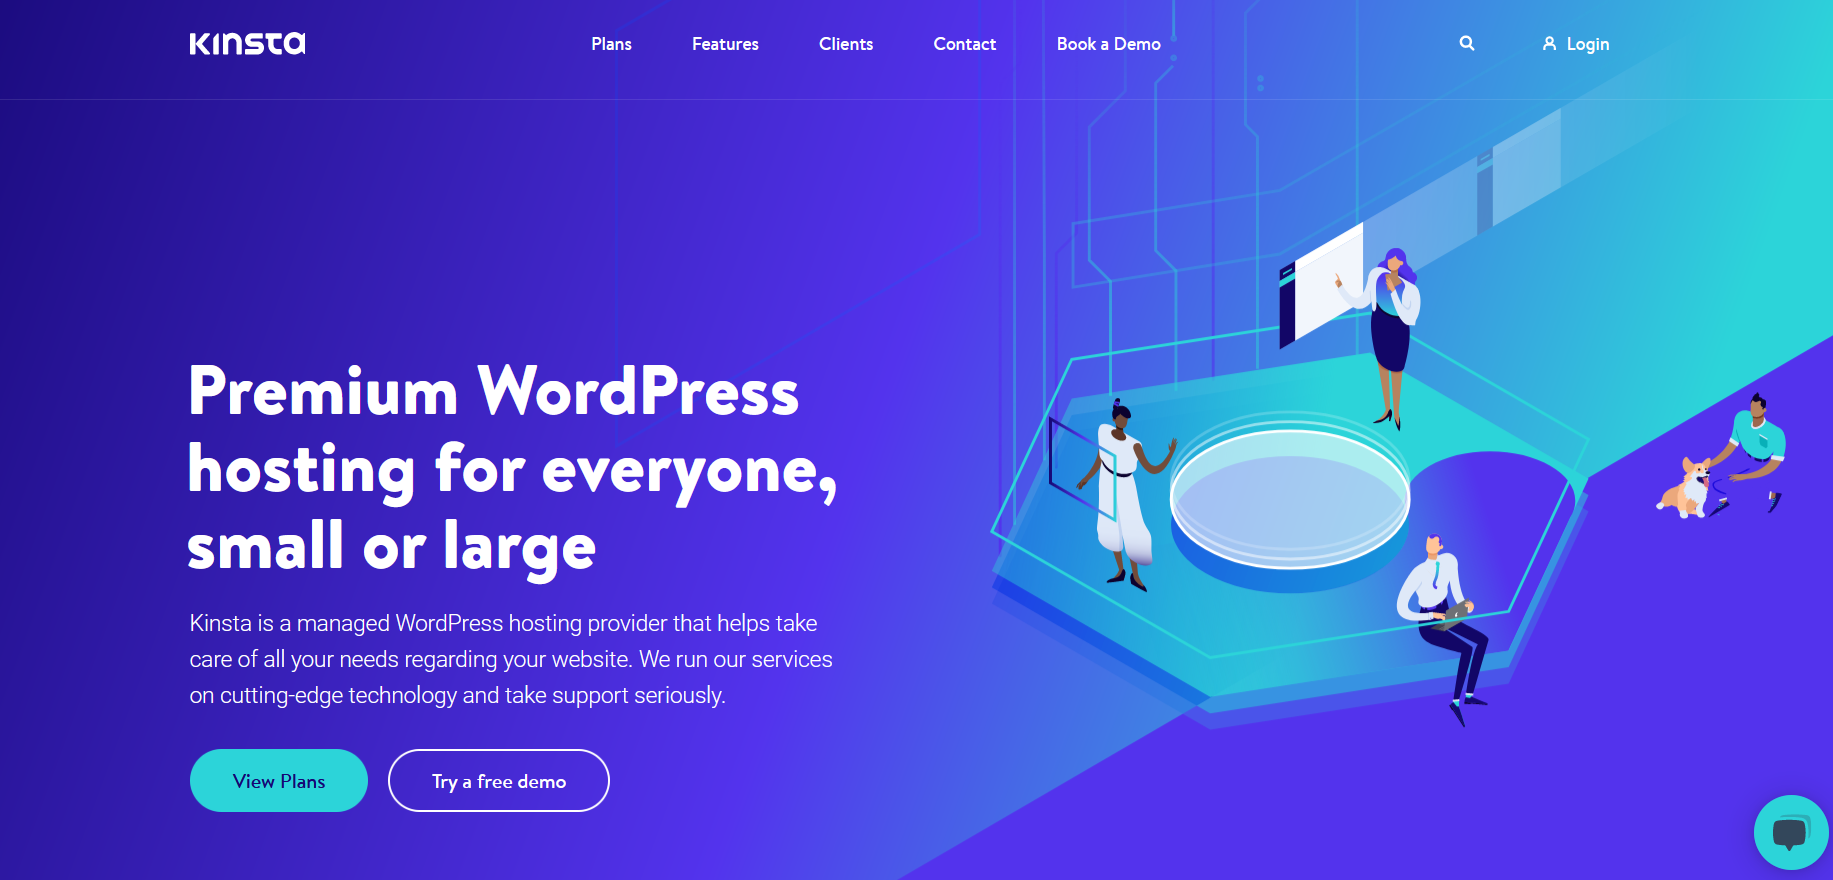 WordPress Hosting Services - kinsta